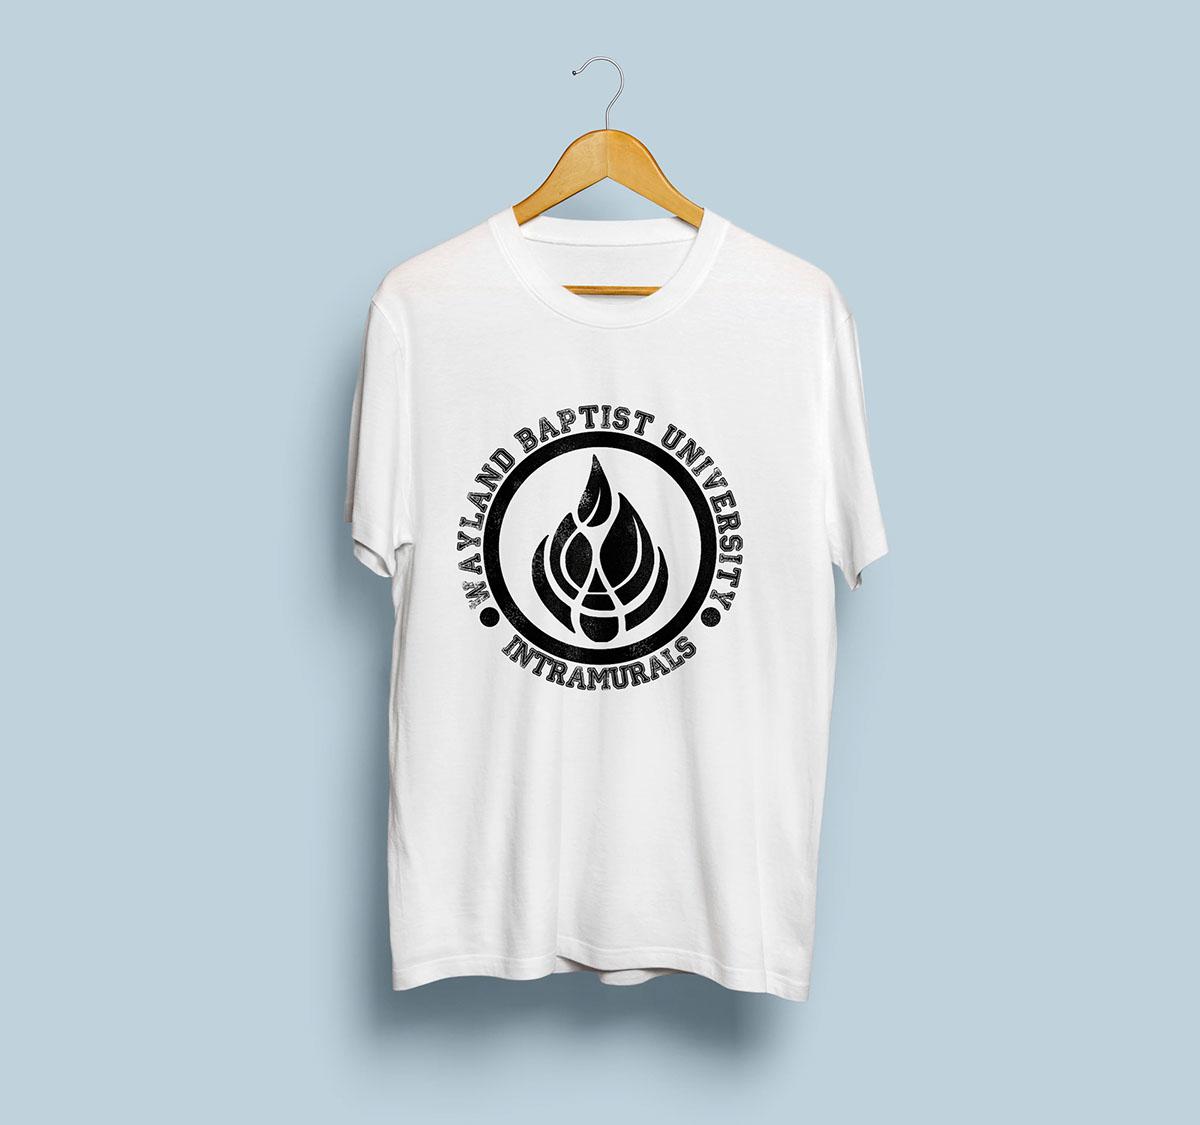 1ee0dbab7 2016 Intramural - Shirt Design on Behance